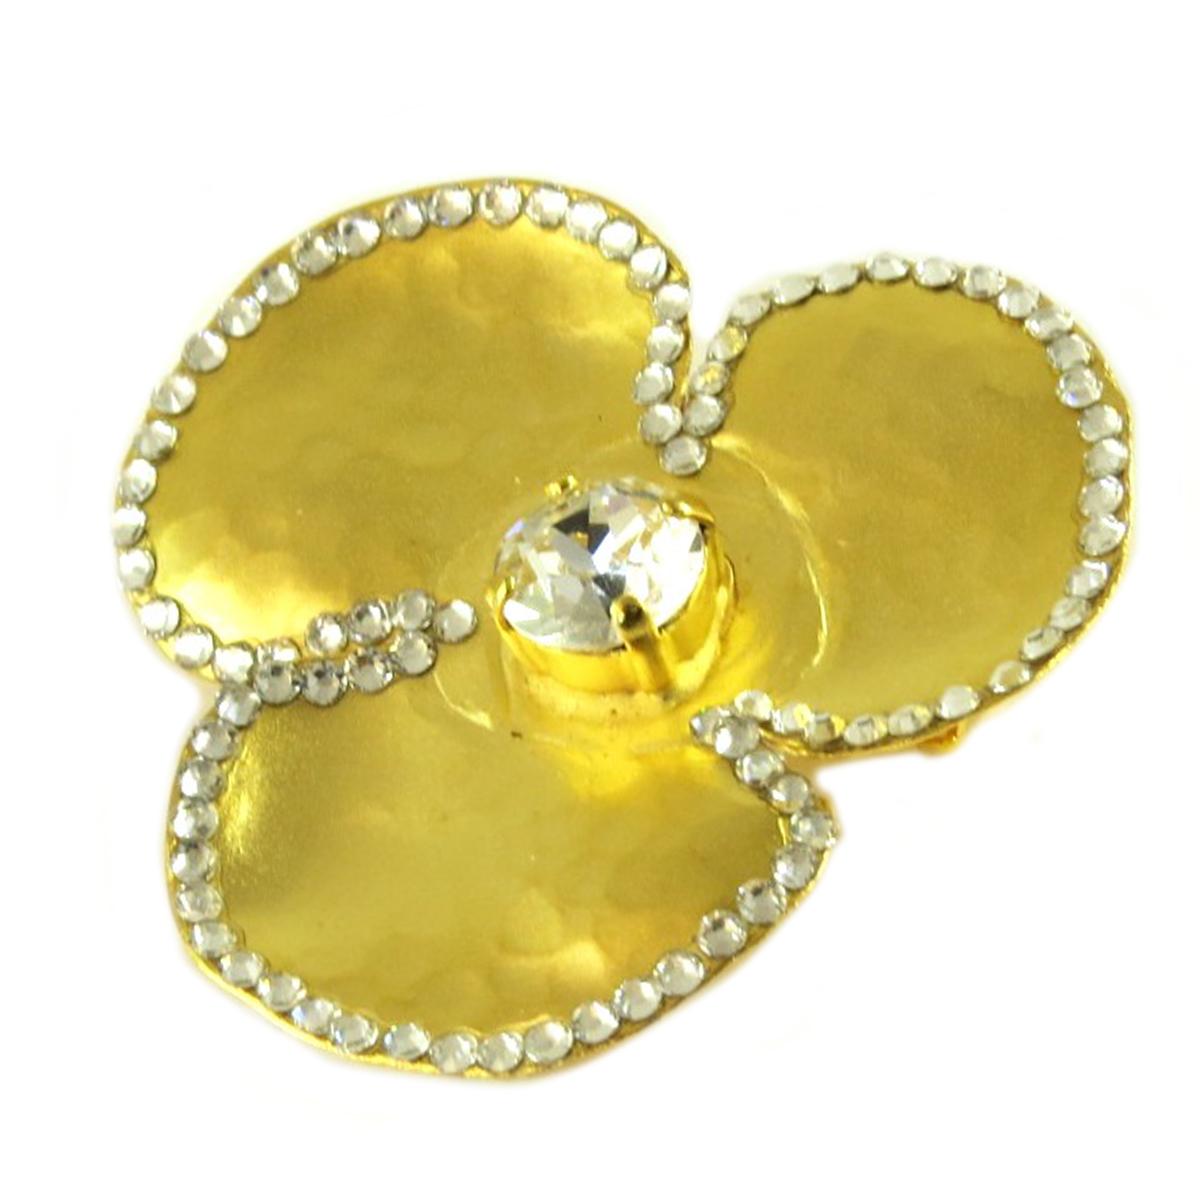 Broche artisanale \'Athena\' blanc doré (fleur) - 40x40 mm - [Q7845]